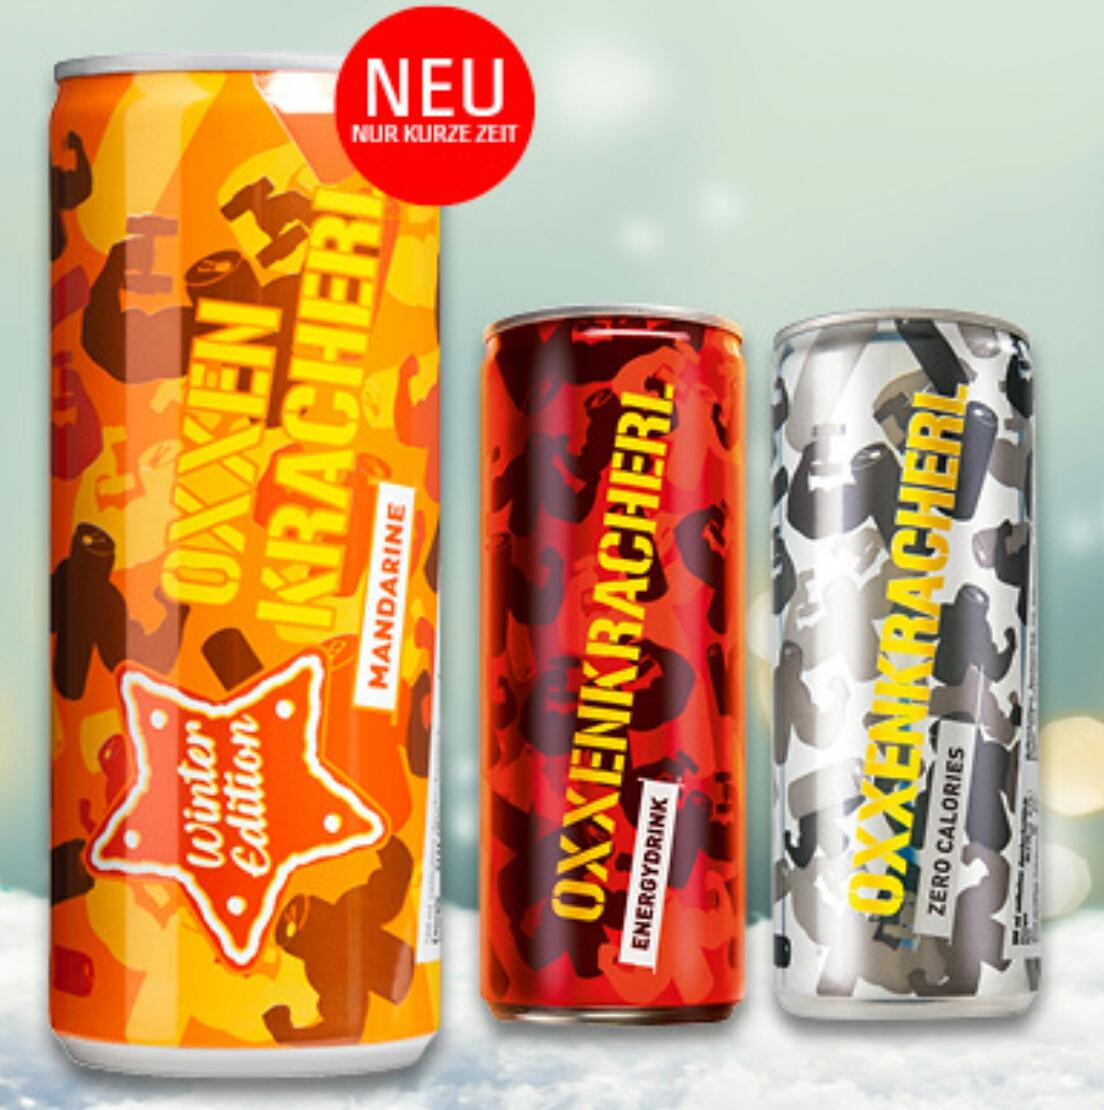 PENNY Oxxenkracherl Energy Drink um nur 0,25€ ab 4 Stück (Neue Sorte: Mandarine)